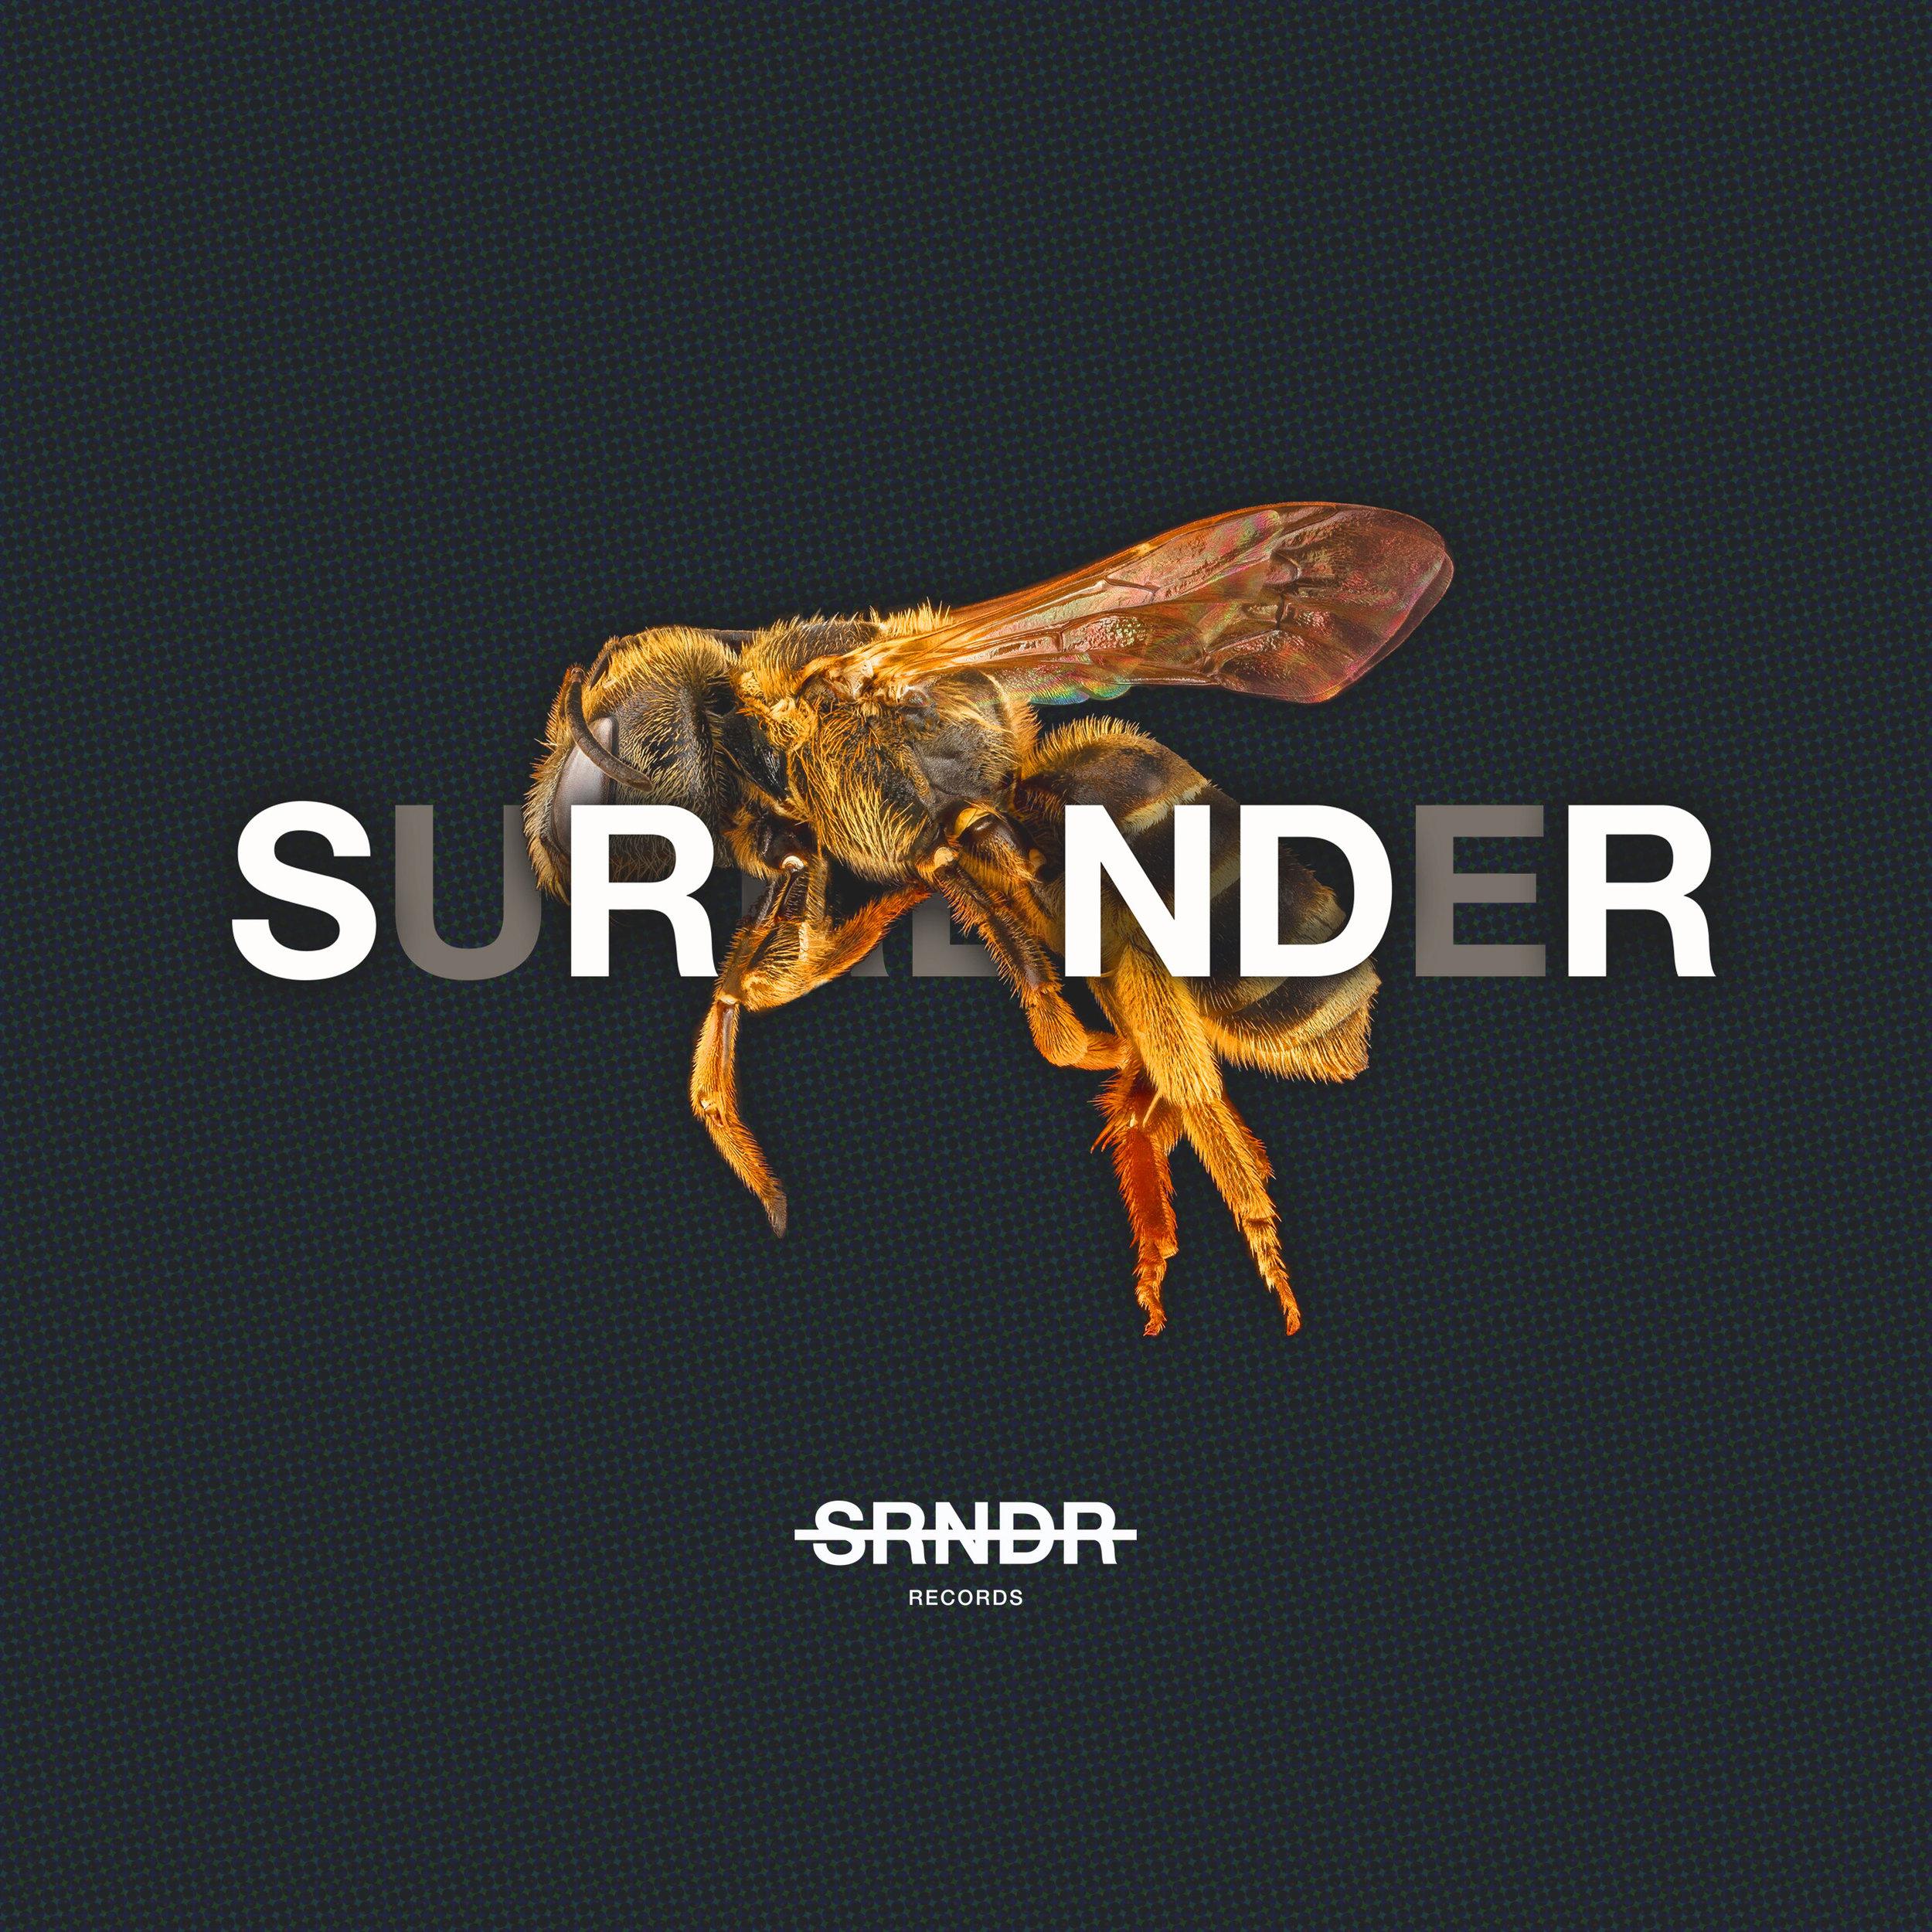 SRNDR-Music-Playlist-Cover.jpg